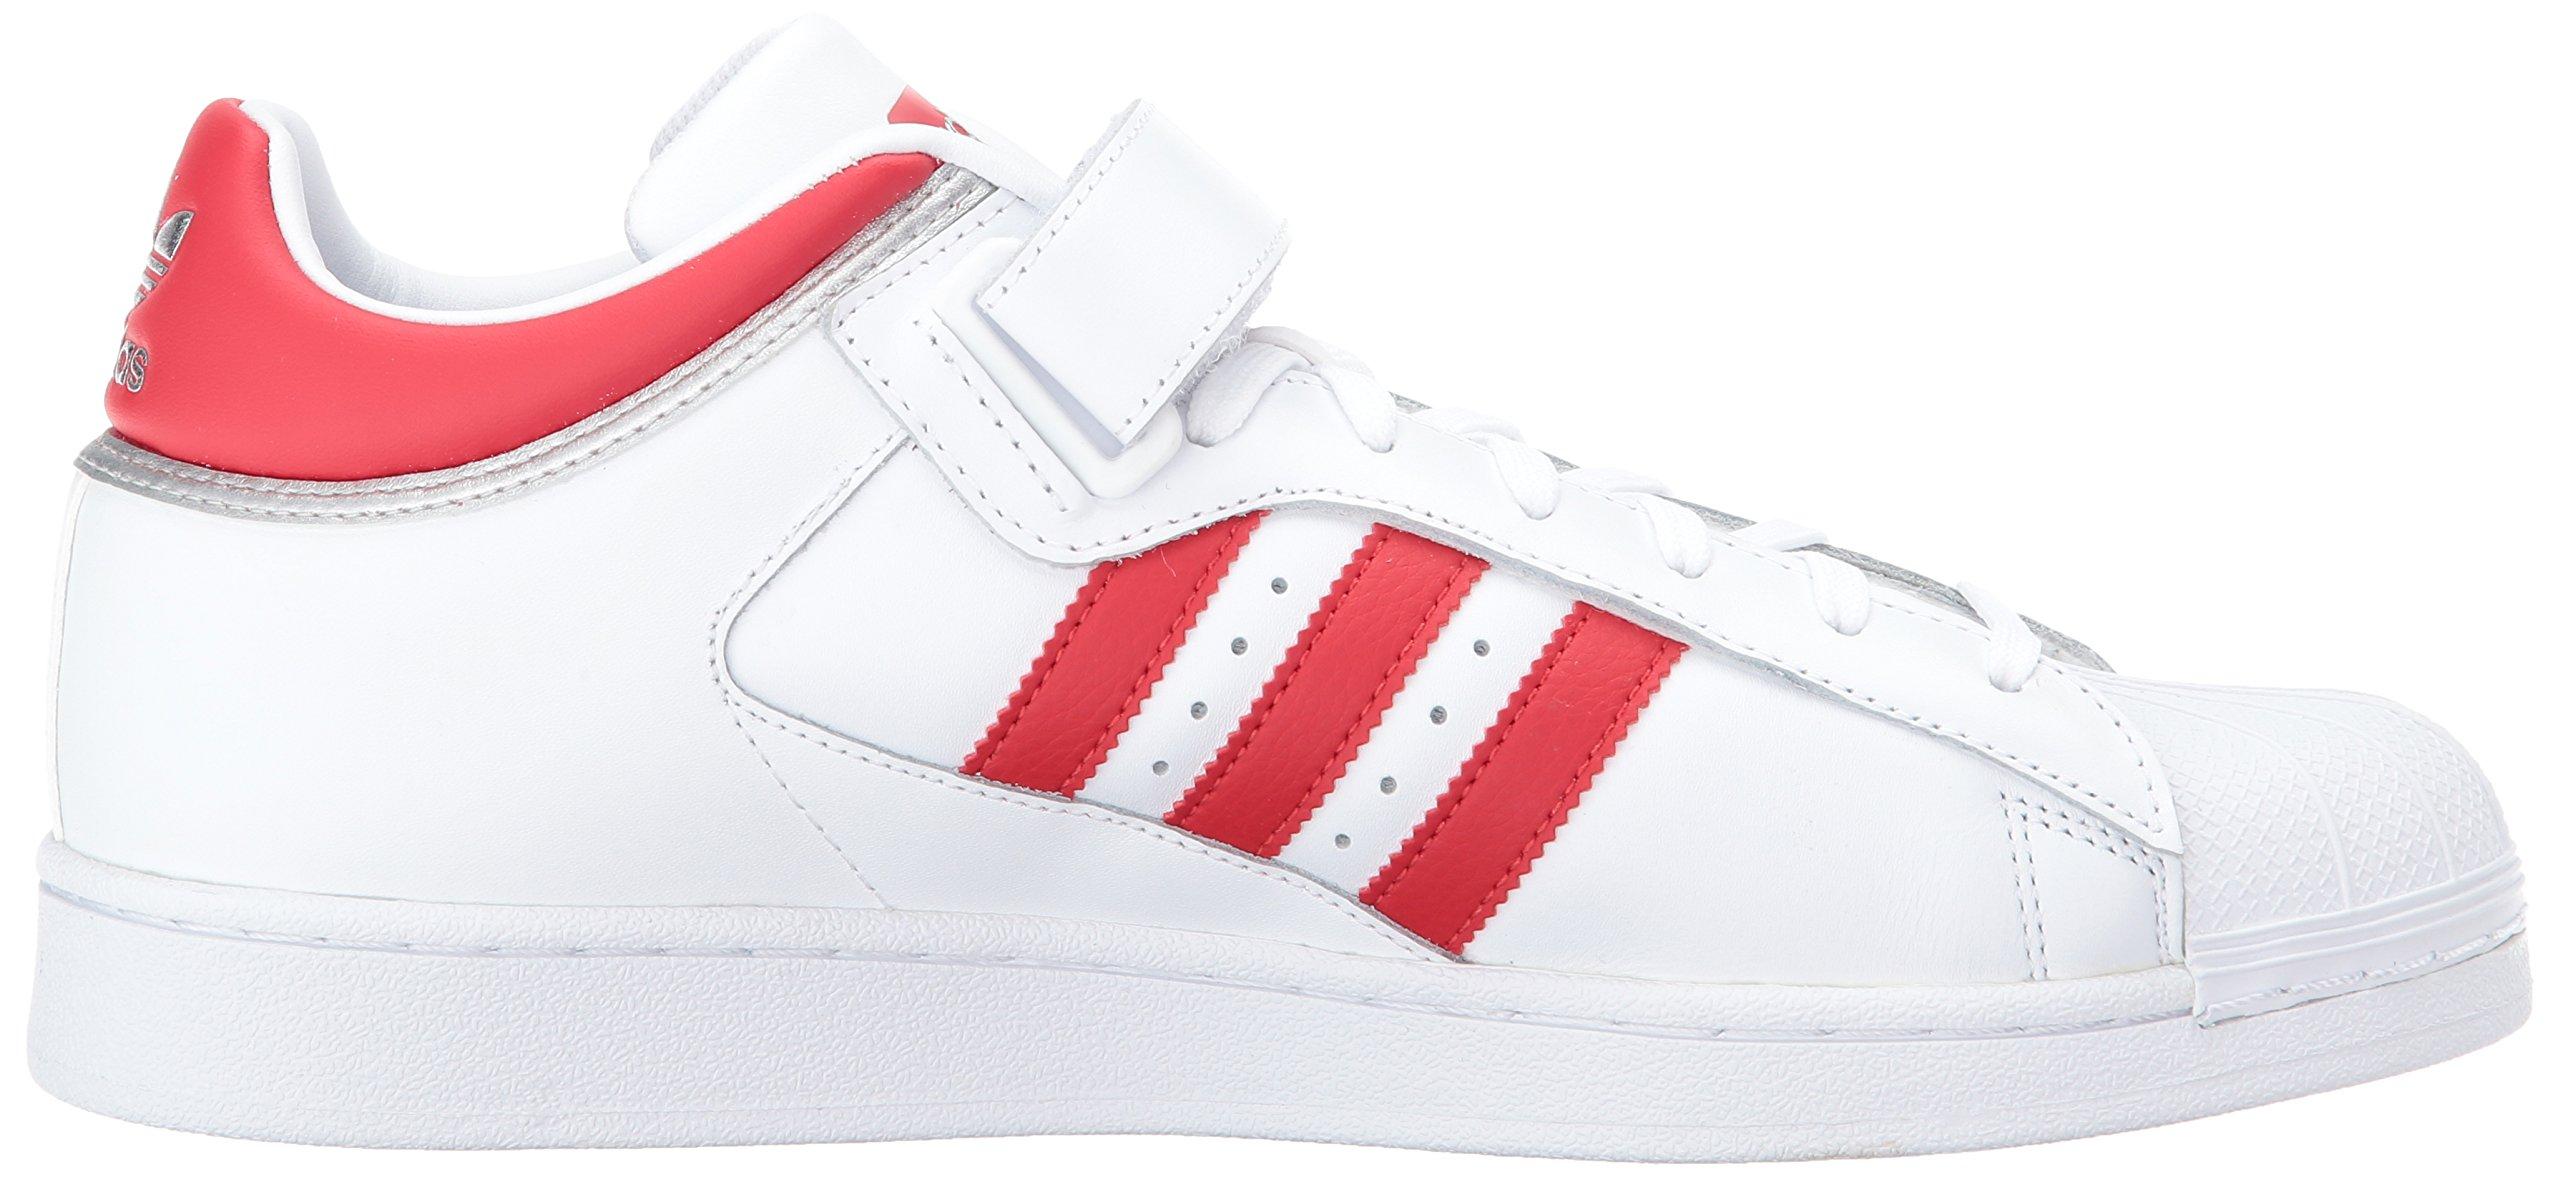 2560x1177 adidas originals men's pro shell fashion sneaker ebay